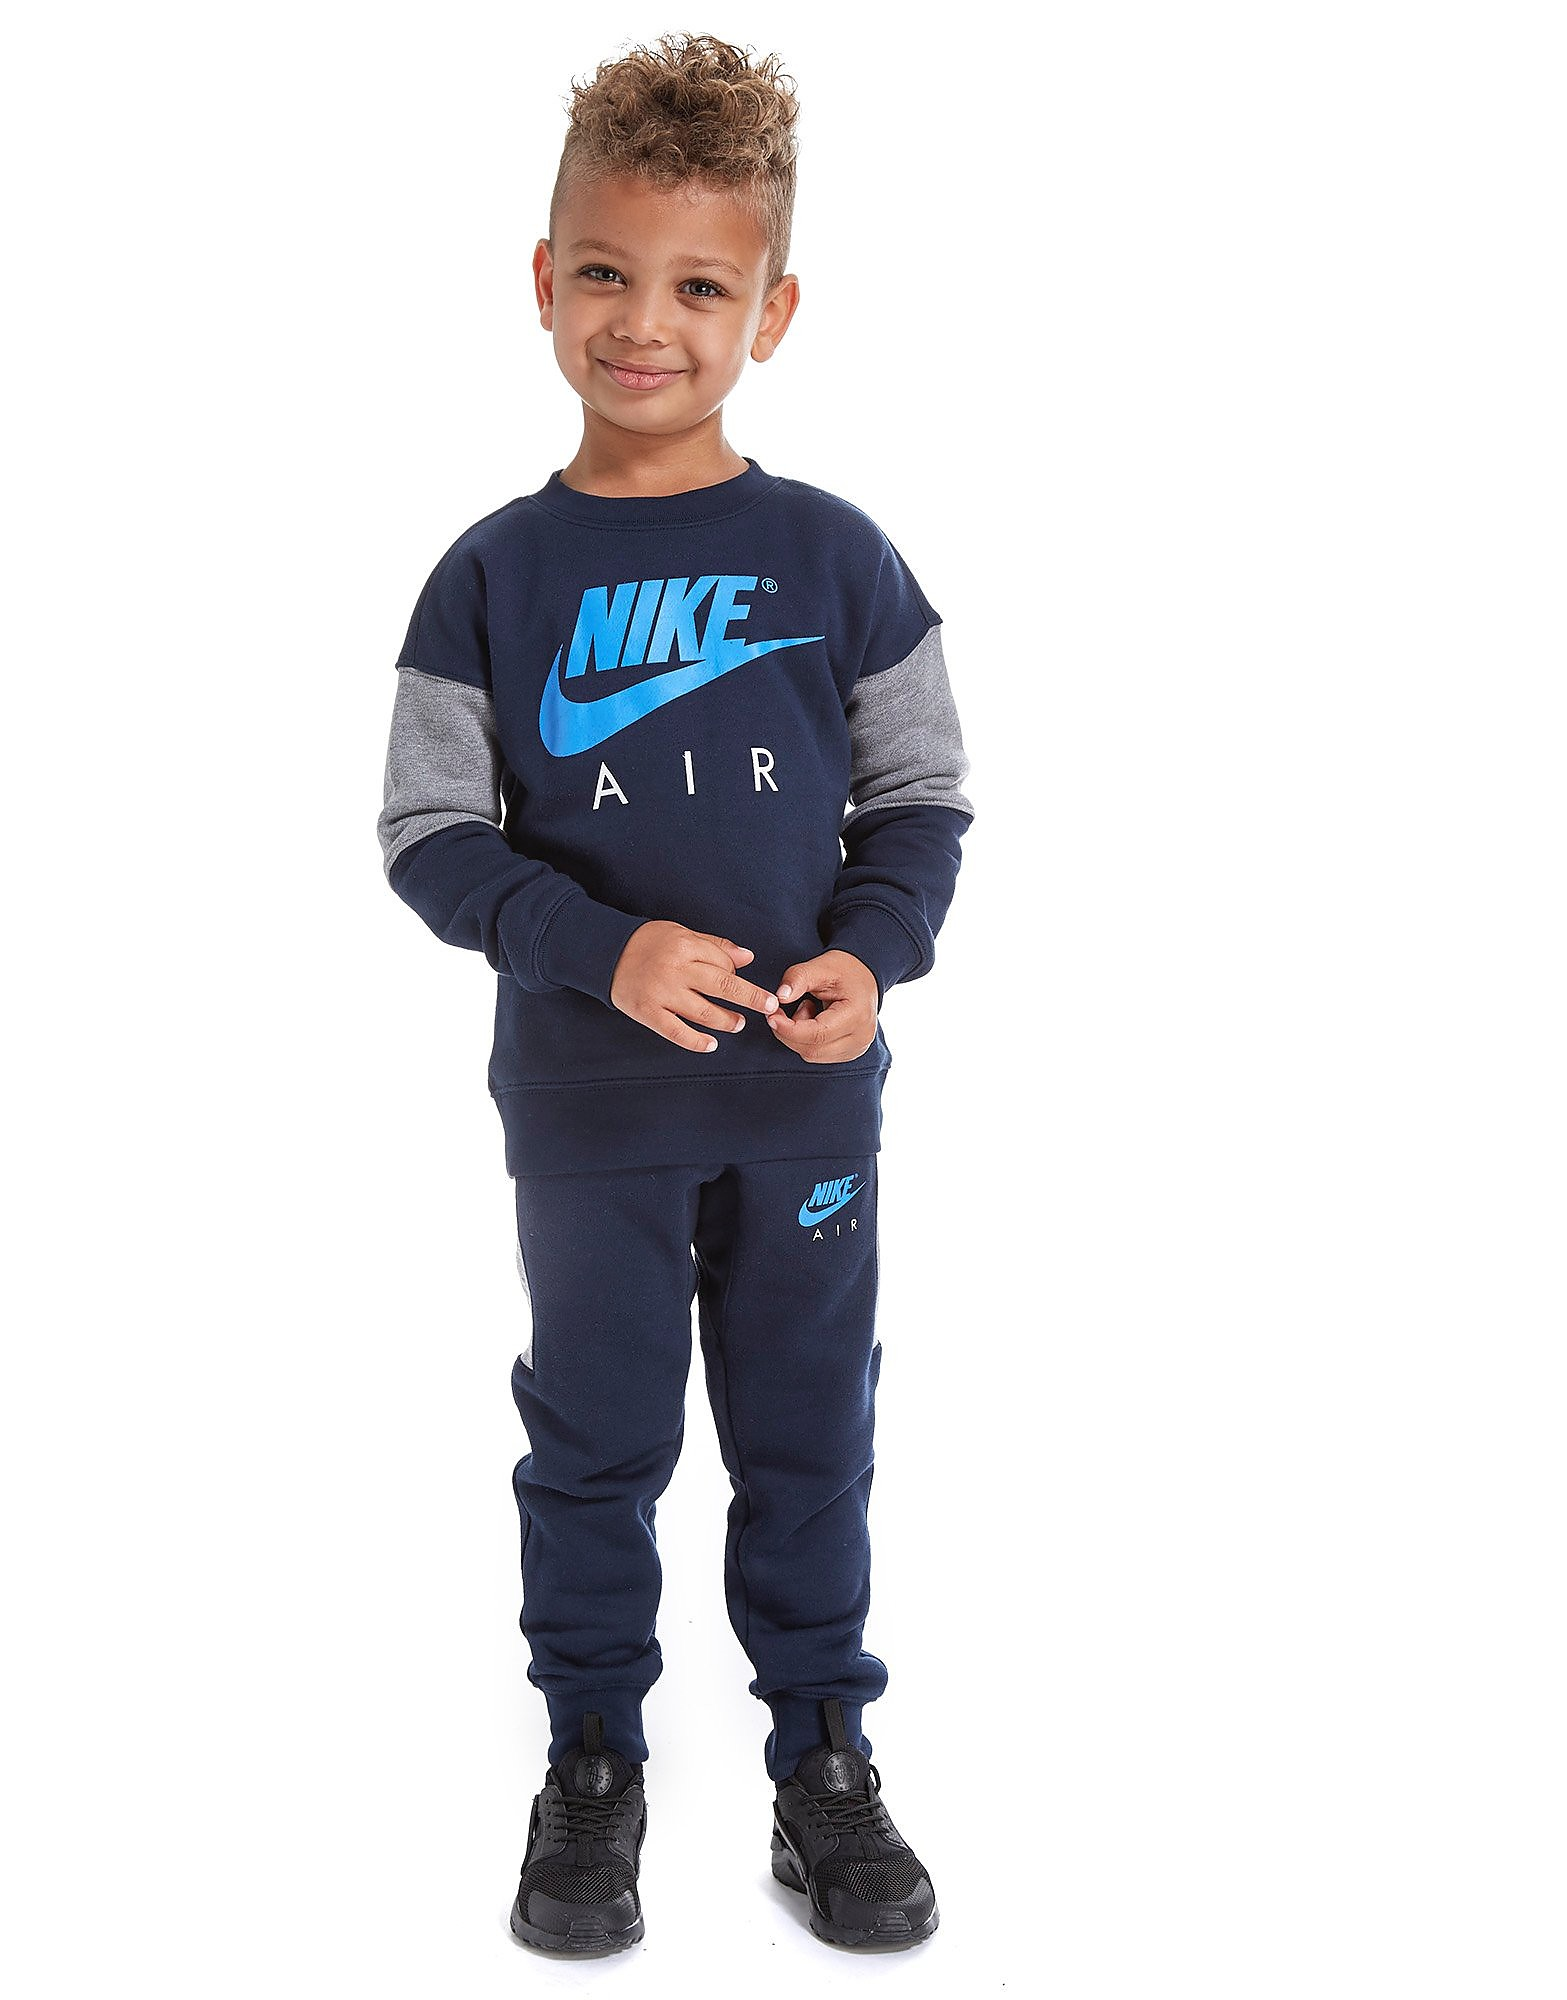 Nike Air Suit Children's